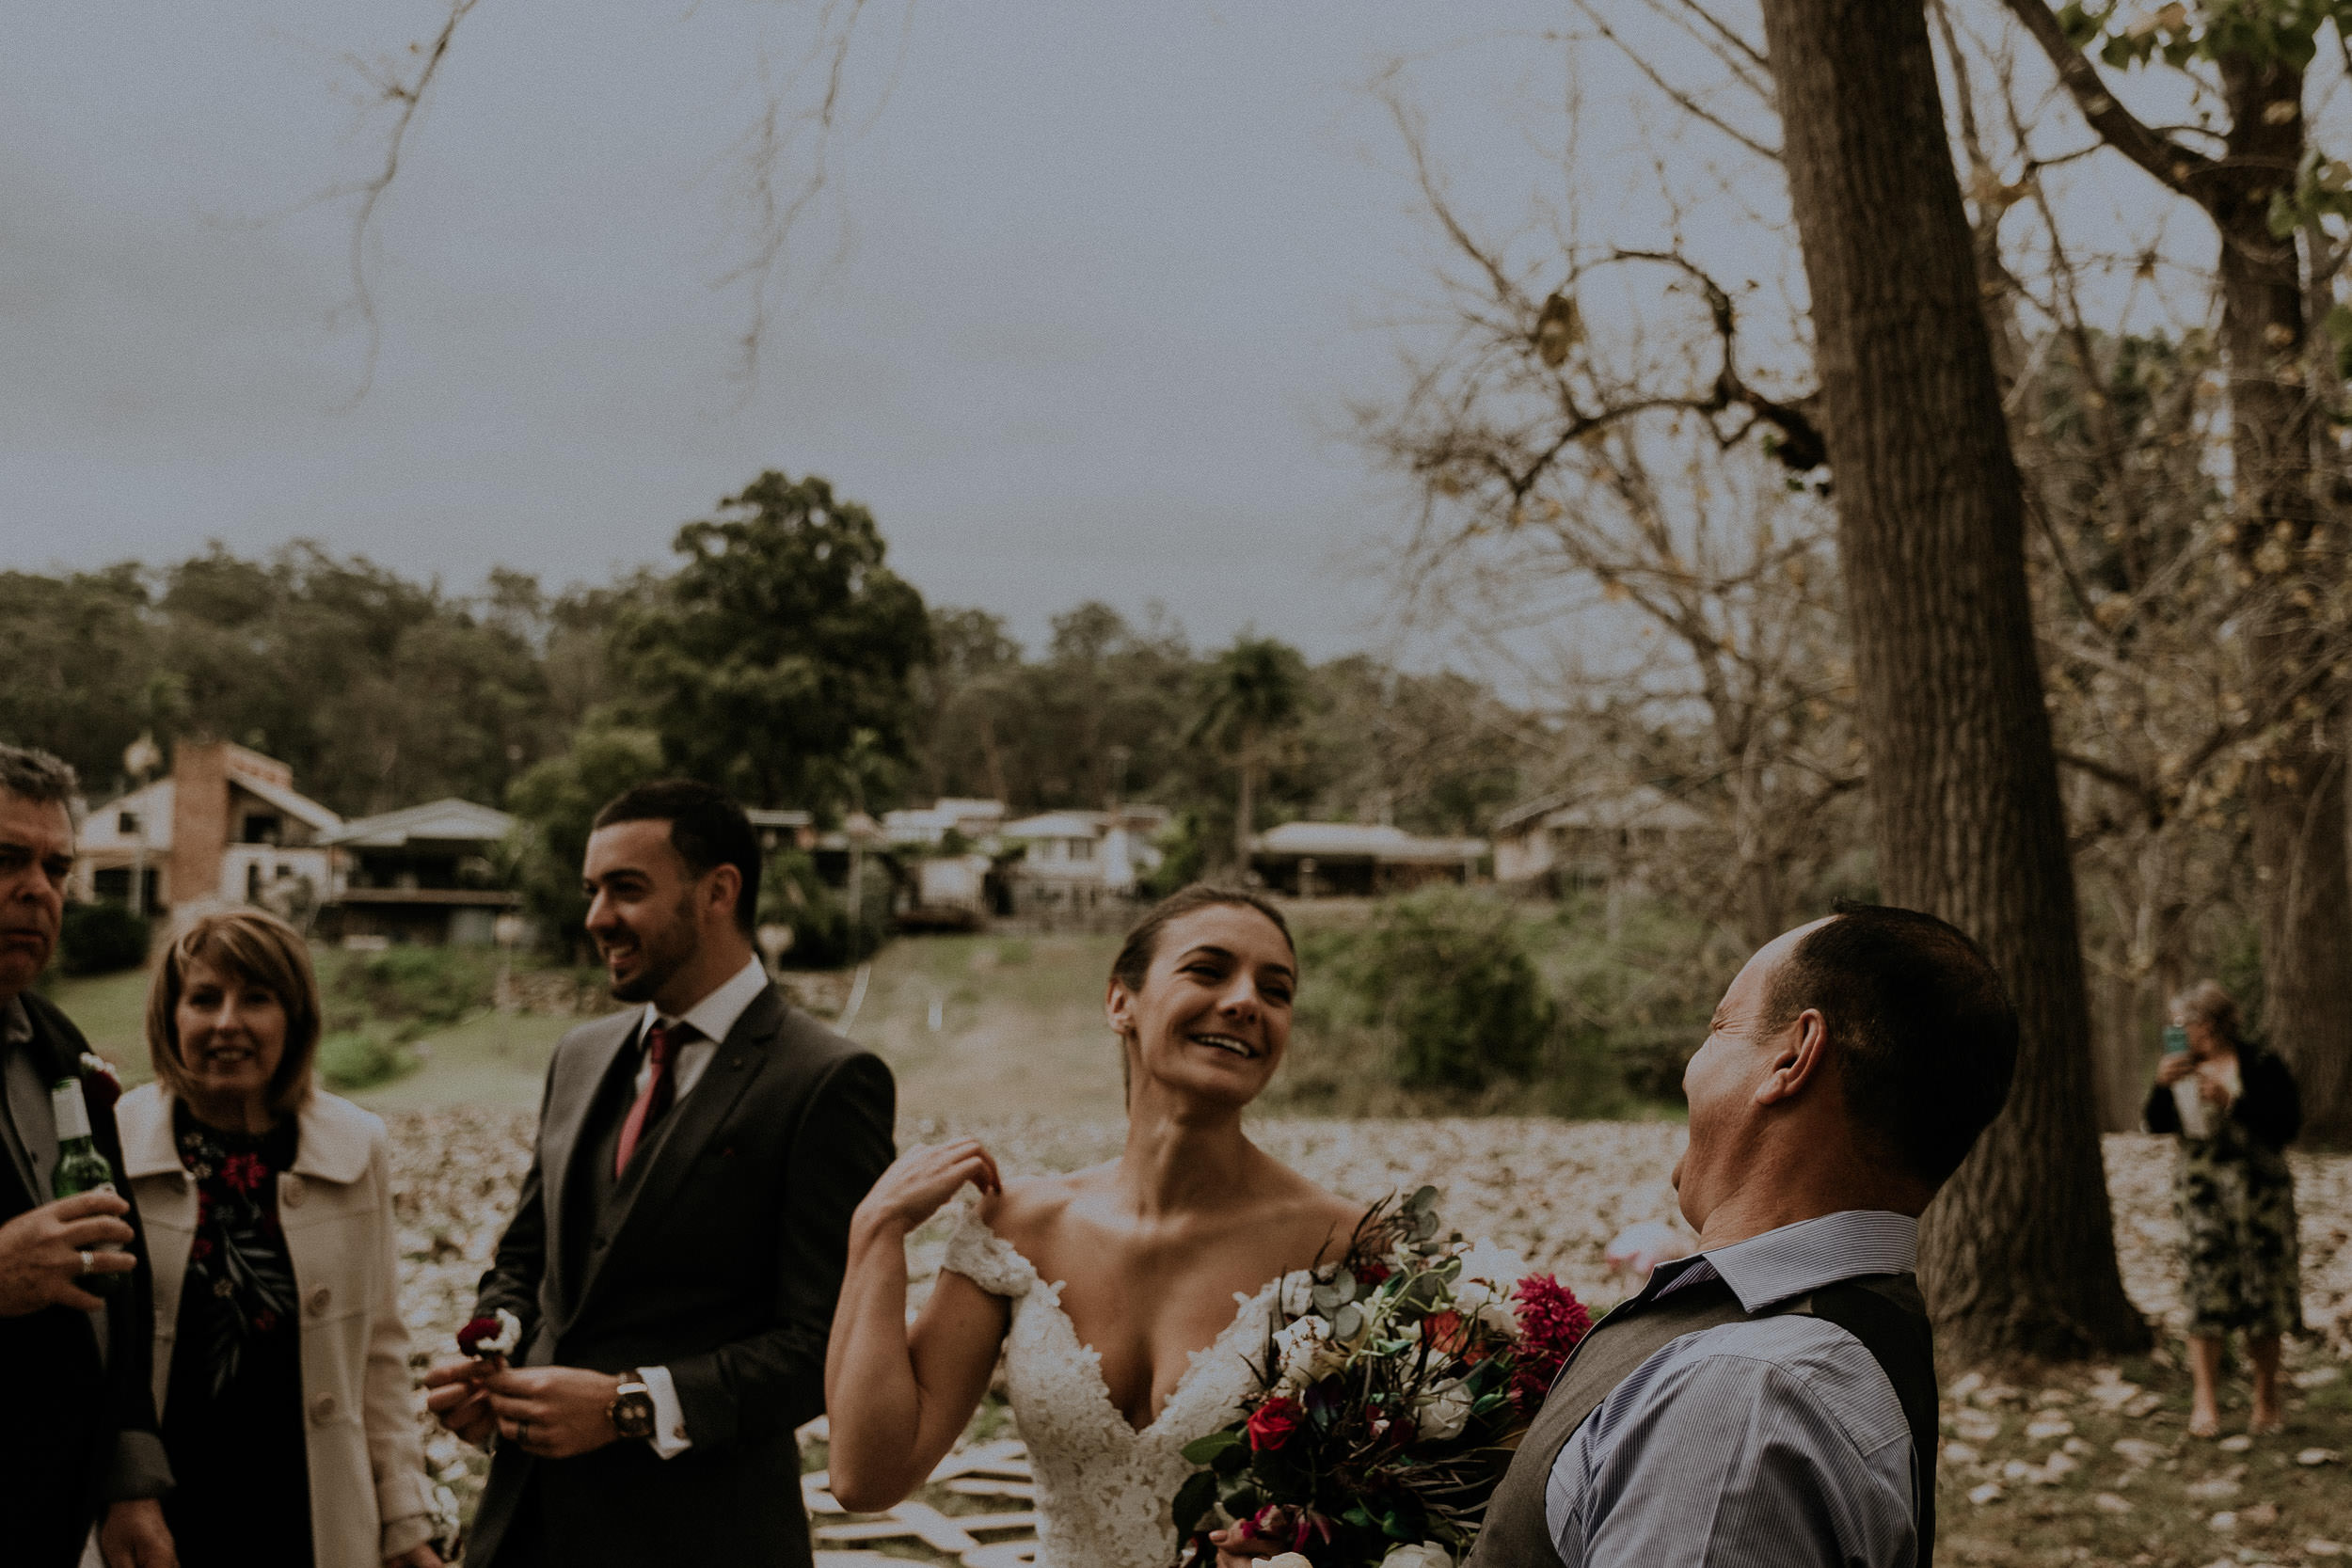 g_c wedding - kings _ thieves elopement wedding photography - blog 70.jpg